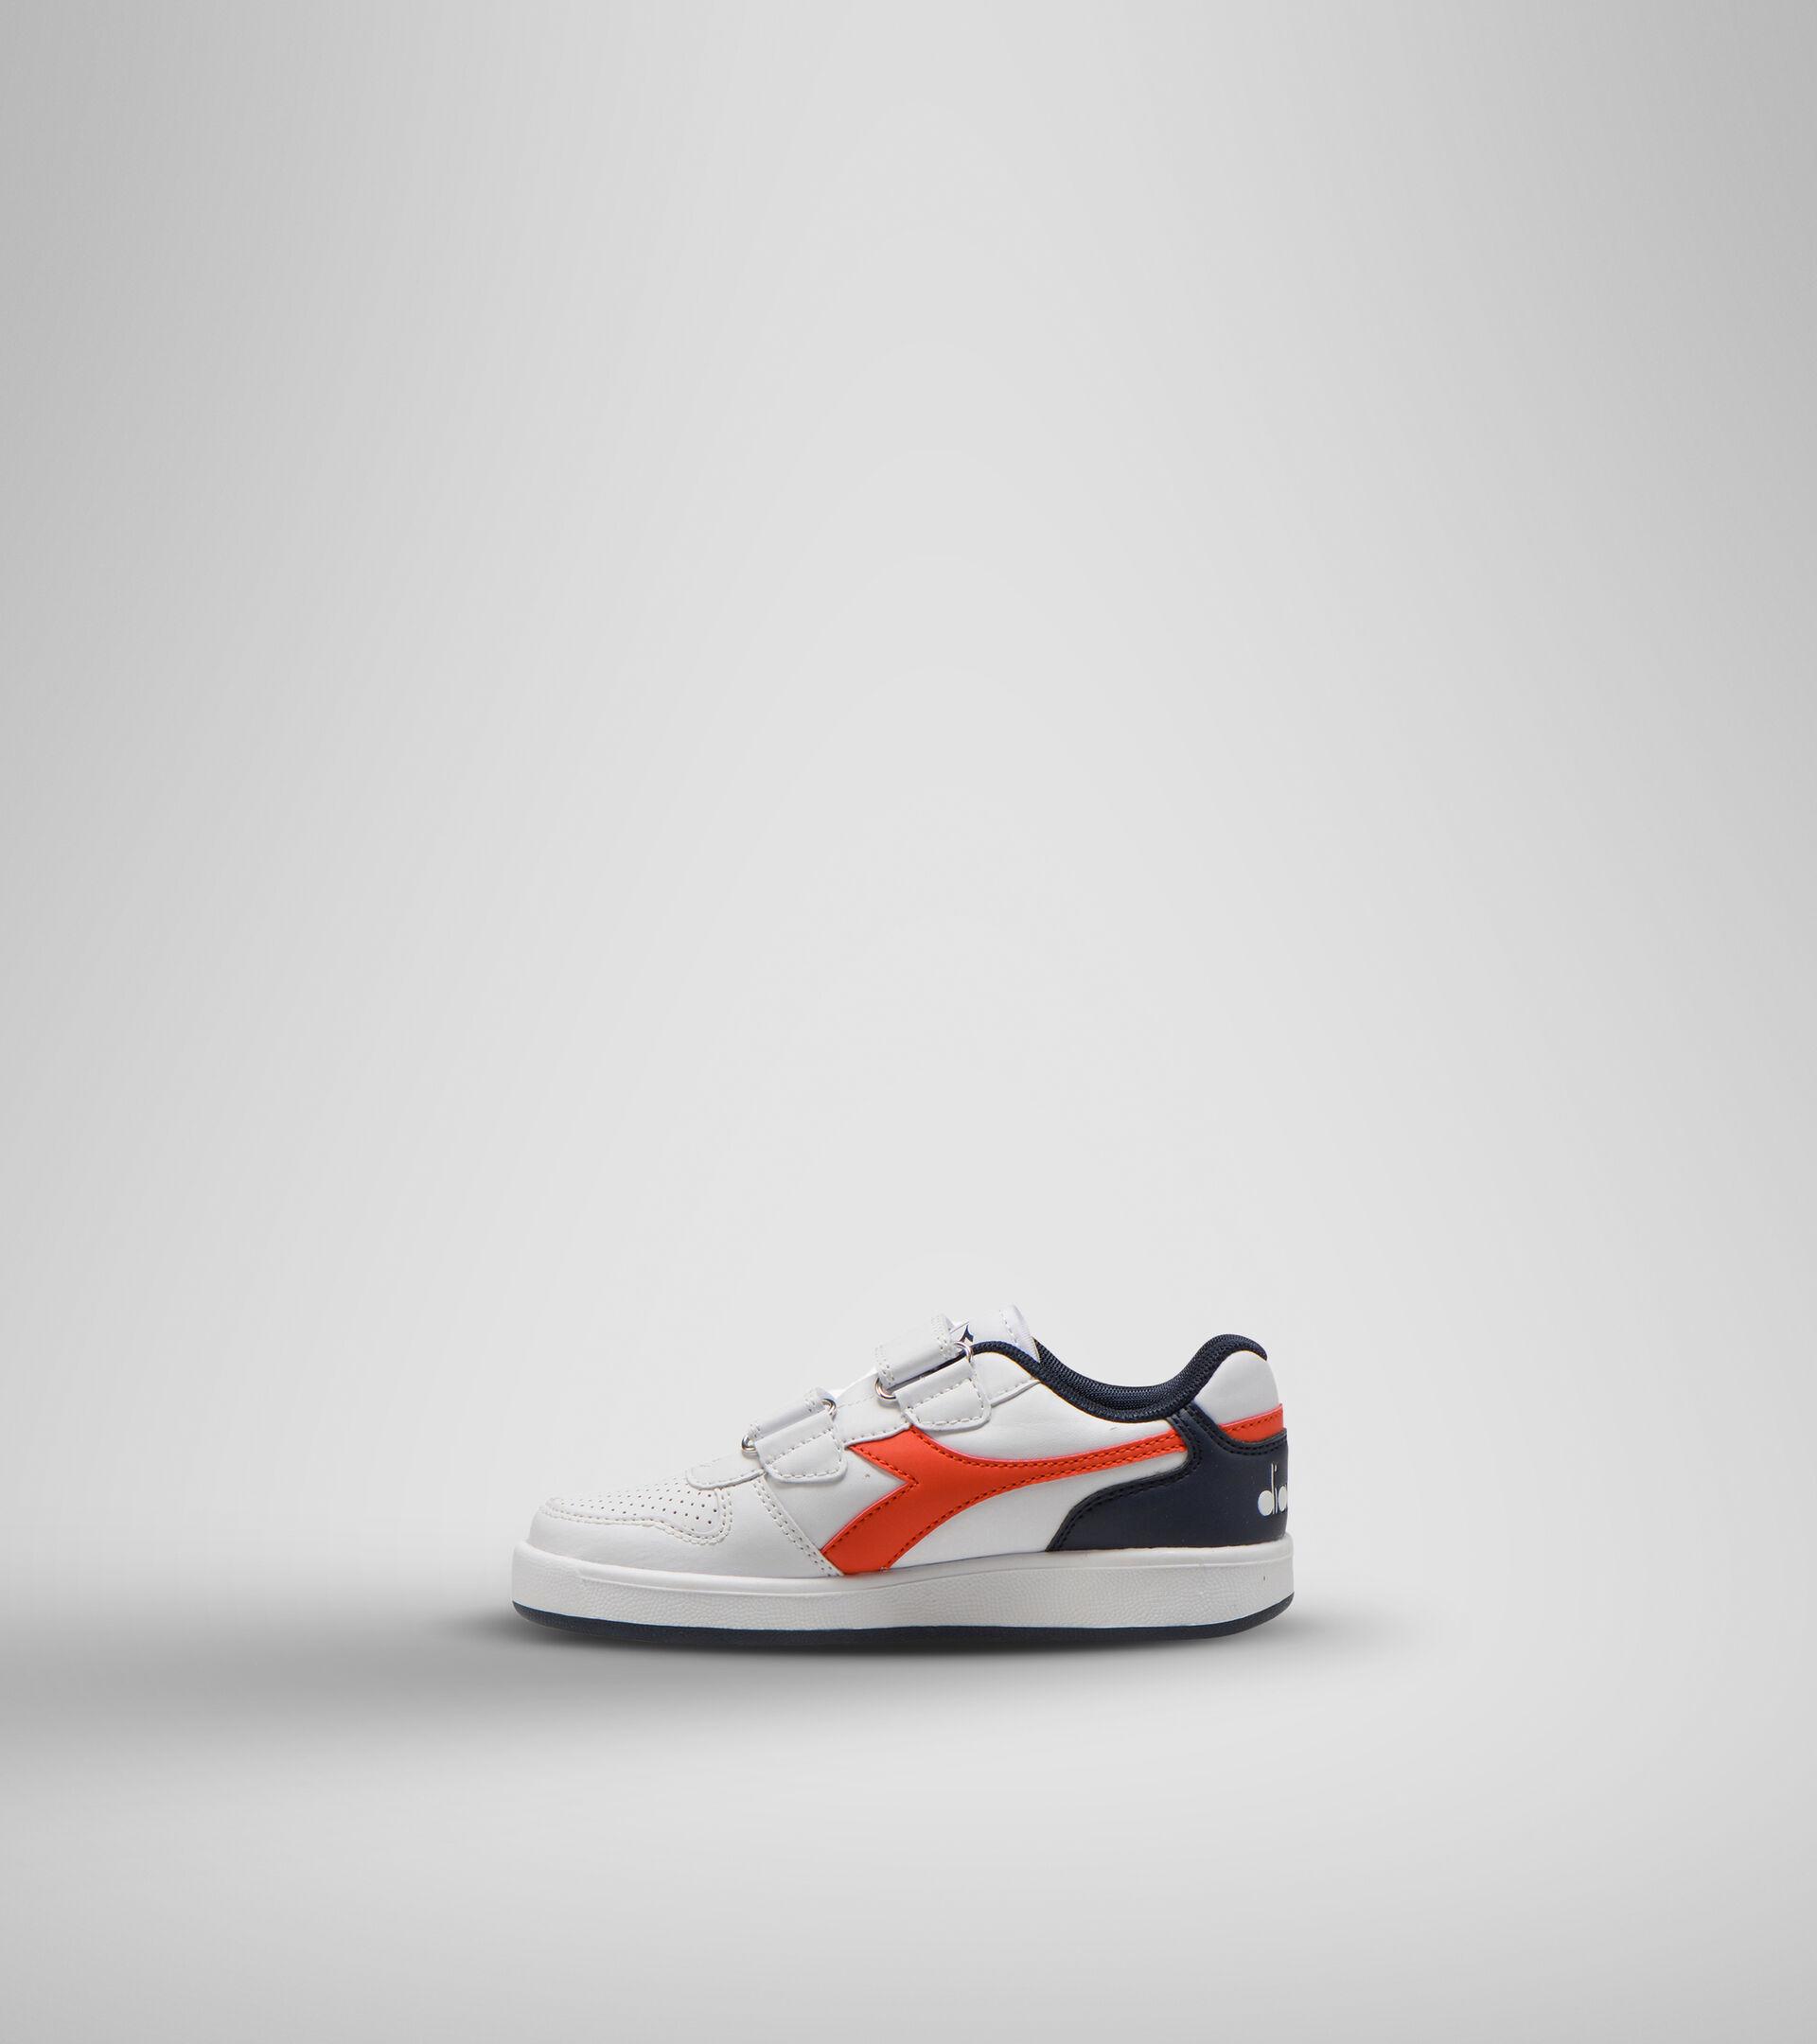 Chaussures de sport - Enfants 4-8 ans PLAYGROUND PS BLANC/ROUGE FIESTA/NOIR IRIS - Diadora